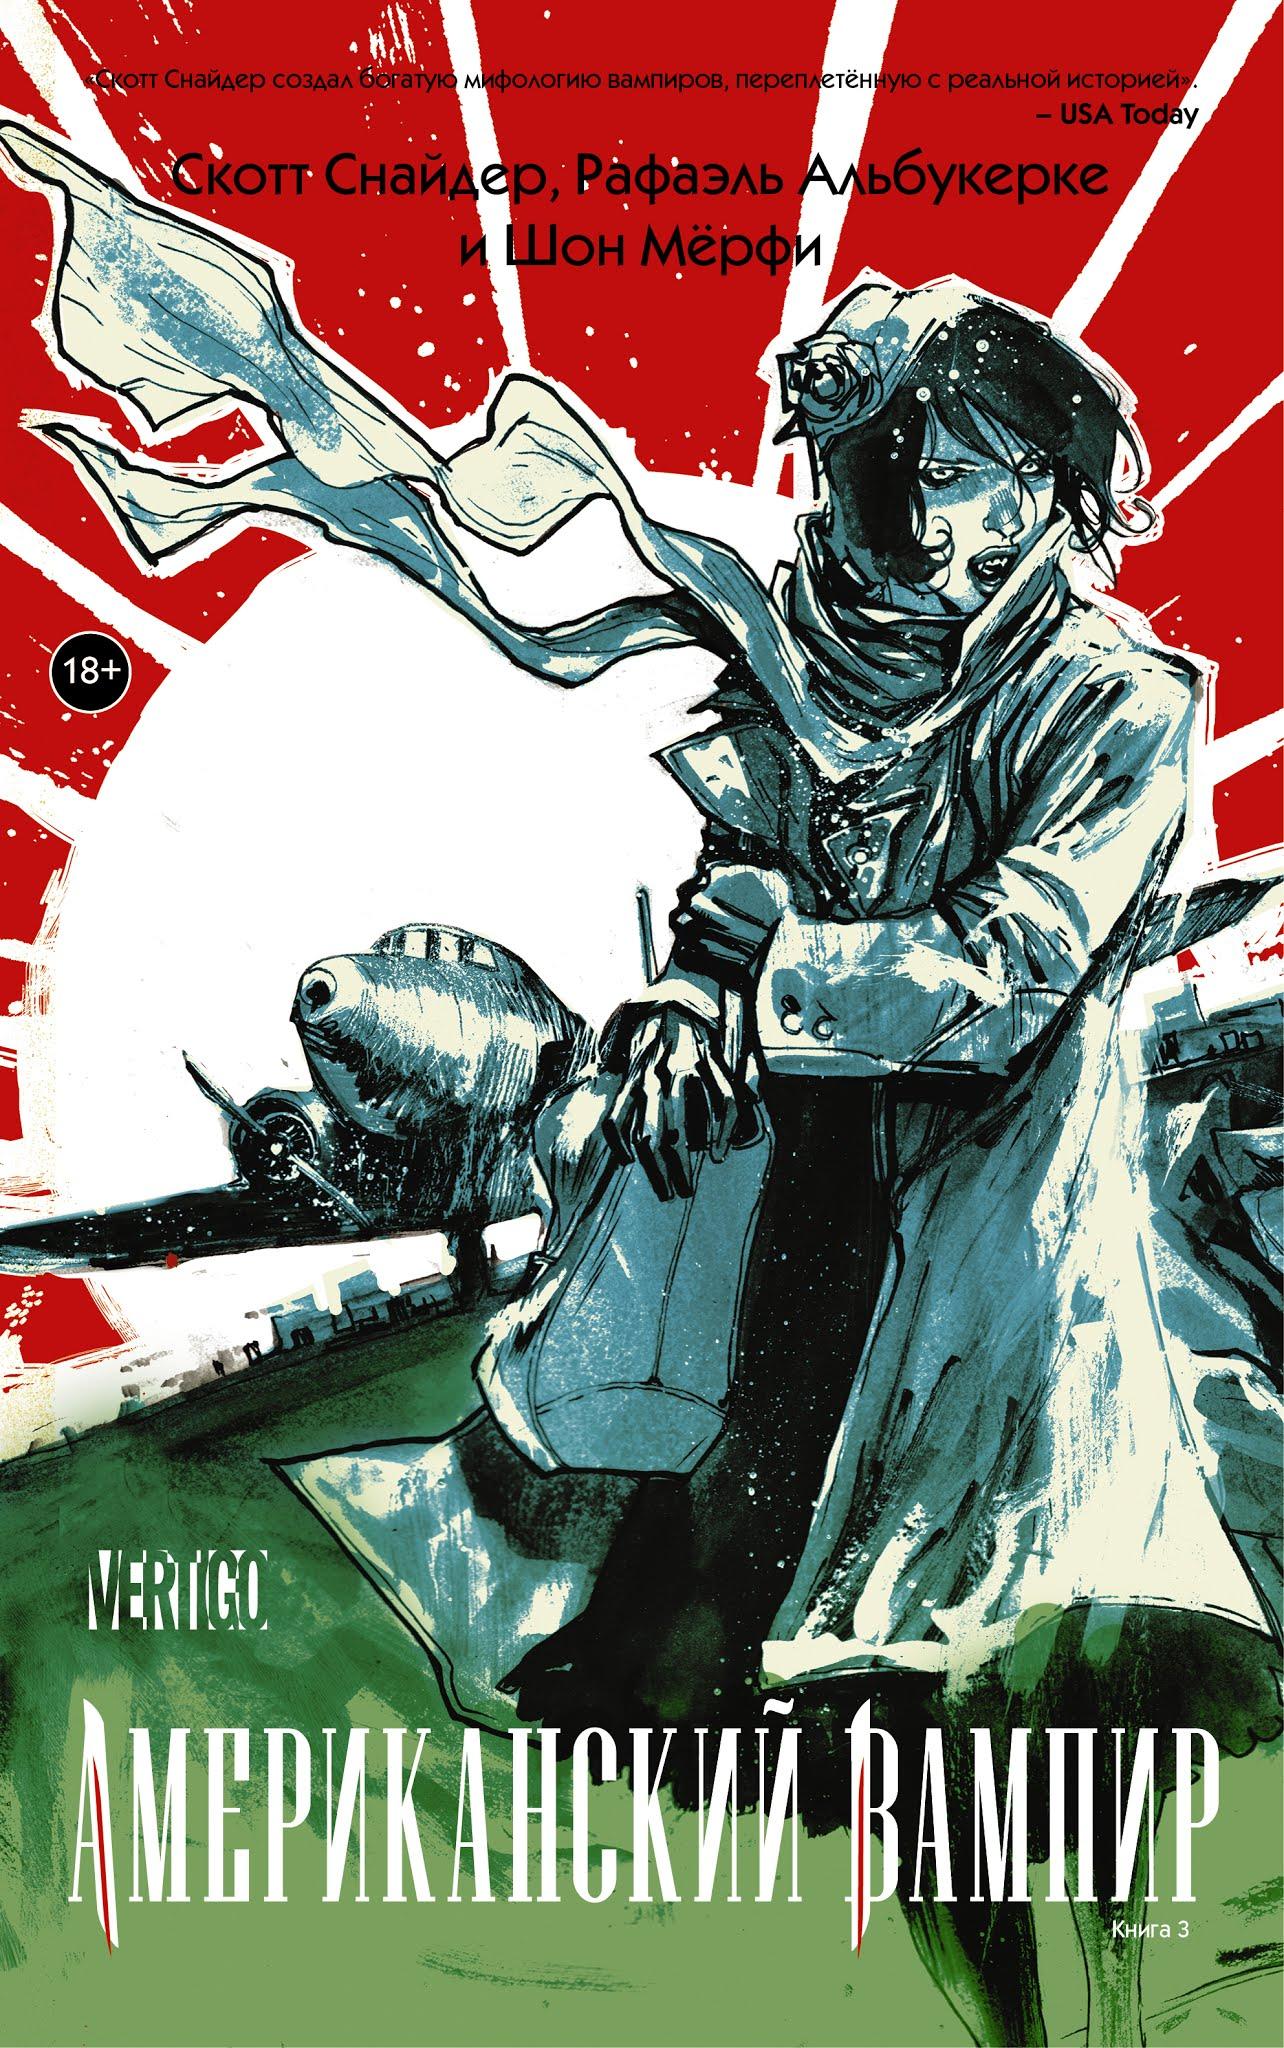 Комикс «Американский Вампир. Книга 3» (2012)